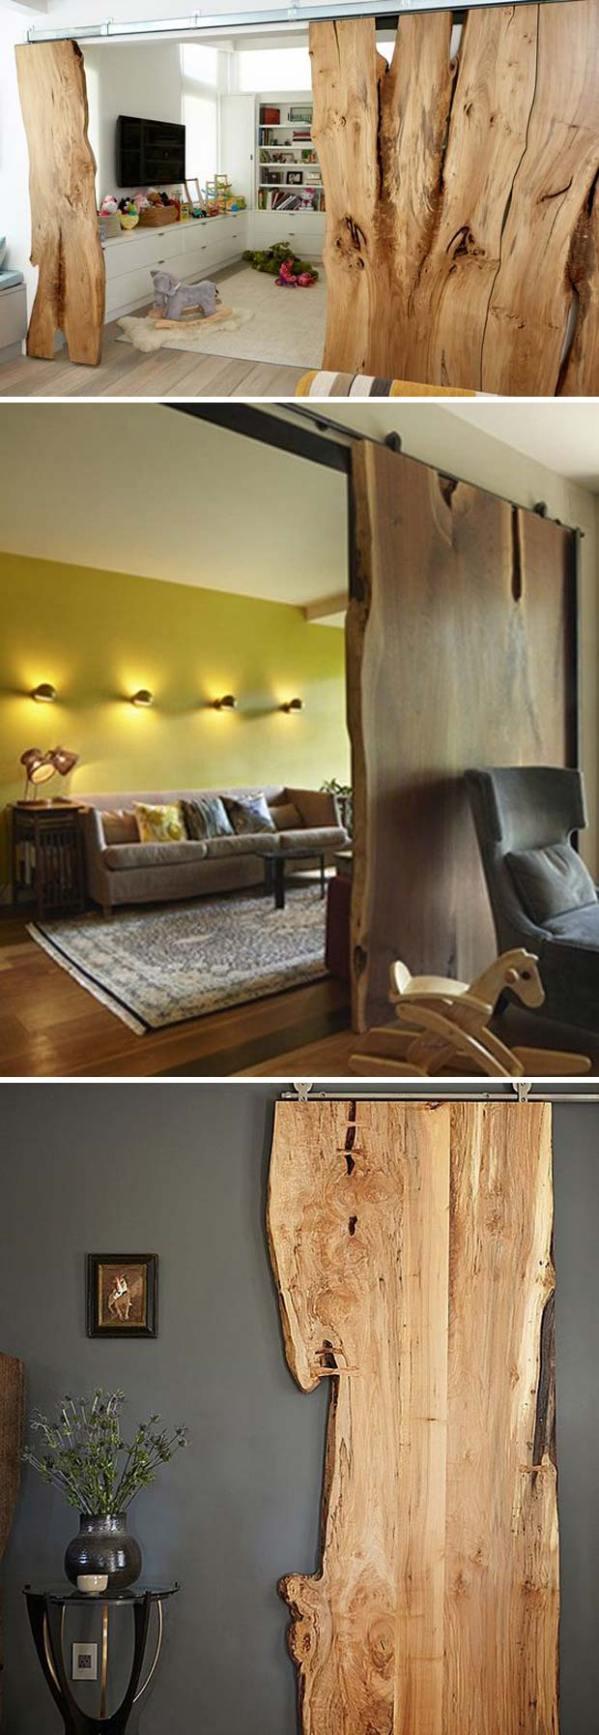 3 live edge wood decoration ideas - 20 Awesome Live Edge Wood Decoration Ideas